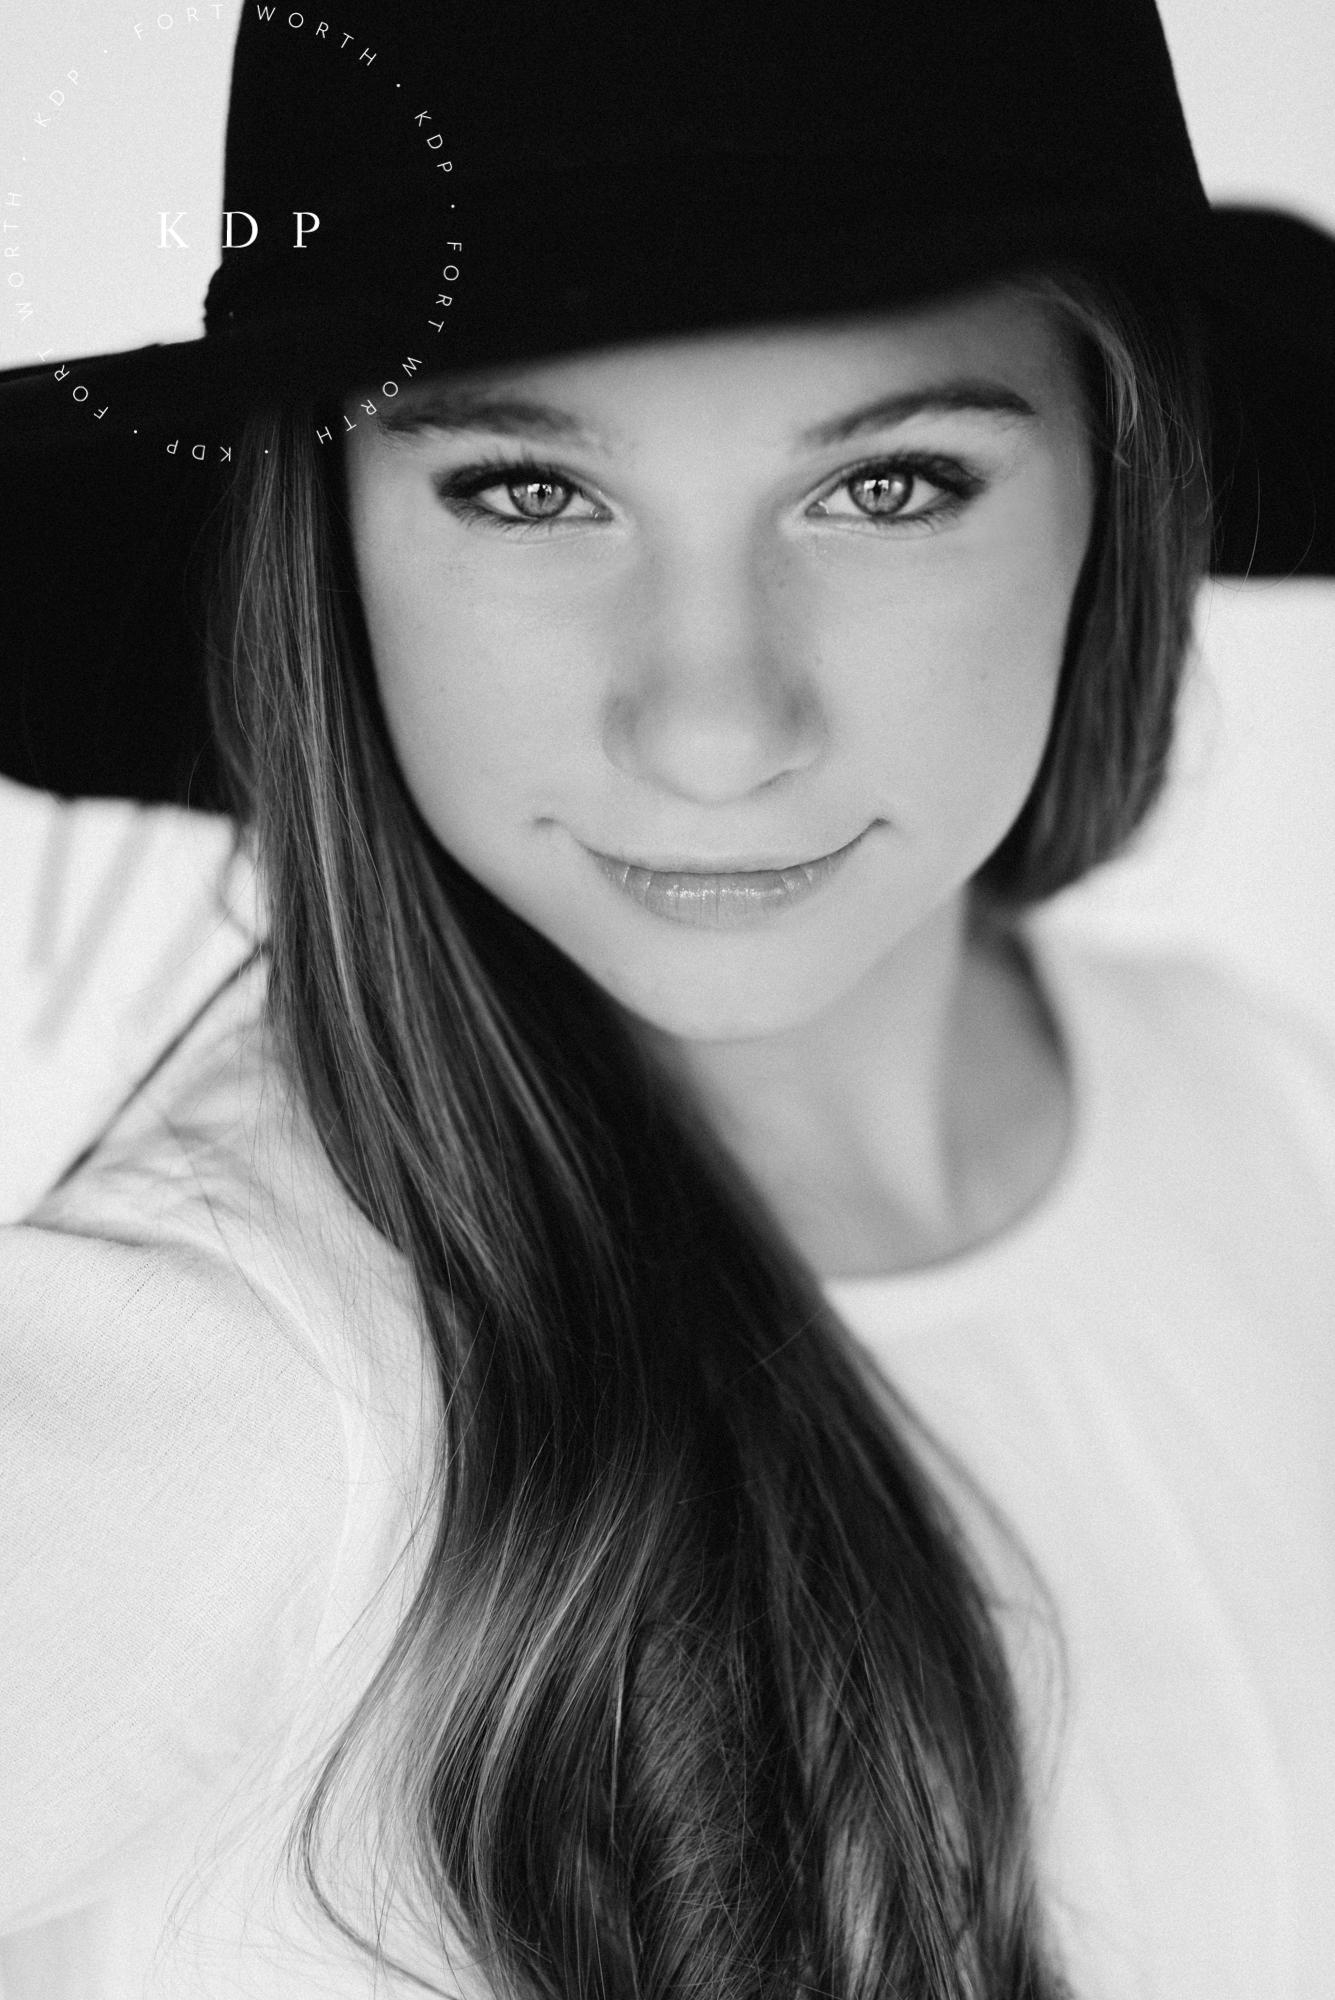 kimberly-danielle-portraits-tweens-model-session-65.jpg